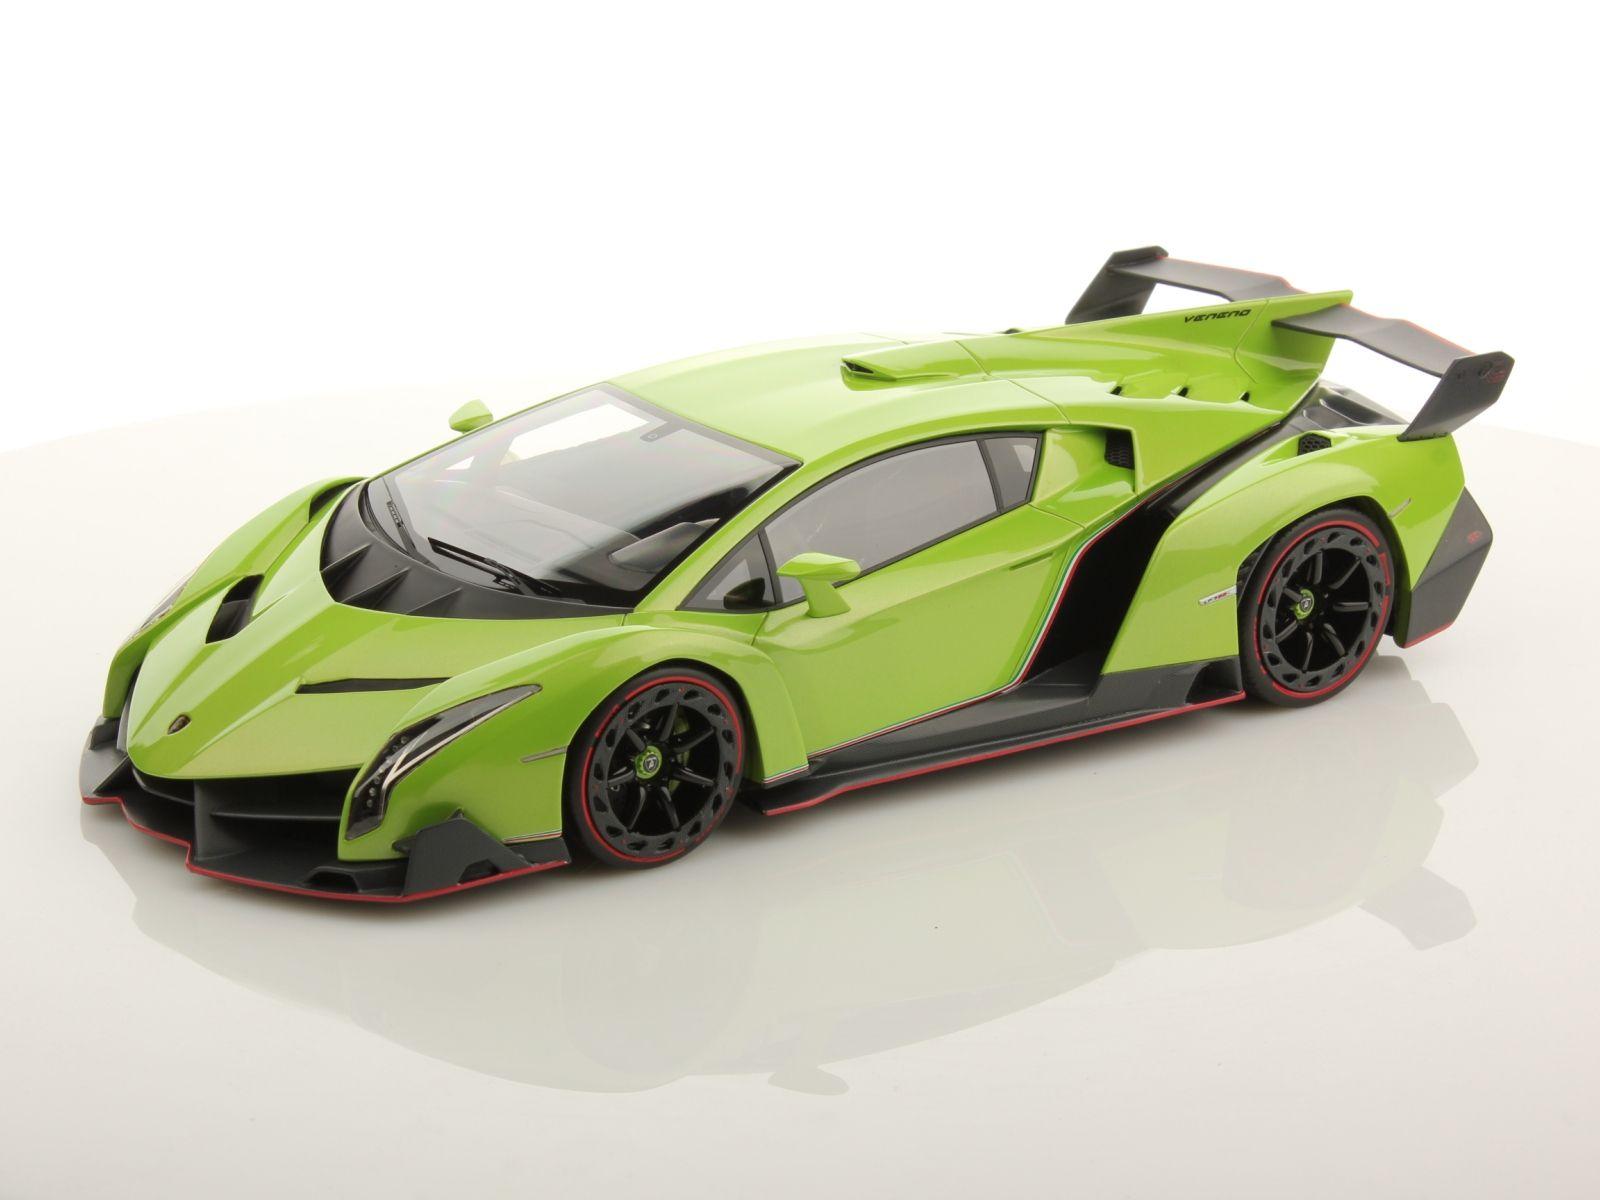 Wallpapers Green And Lamborghini On Pinterest: Lamborghini Veneno Green Miniatur Hd Wallpaper